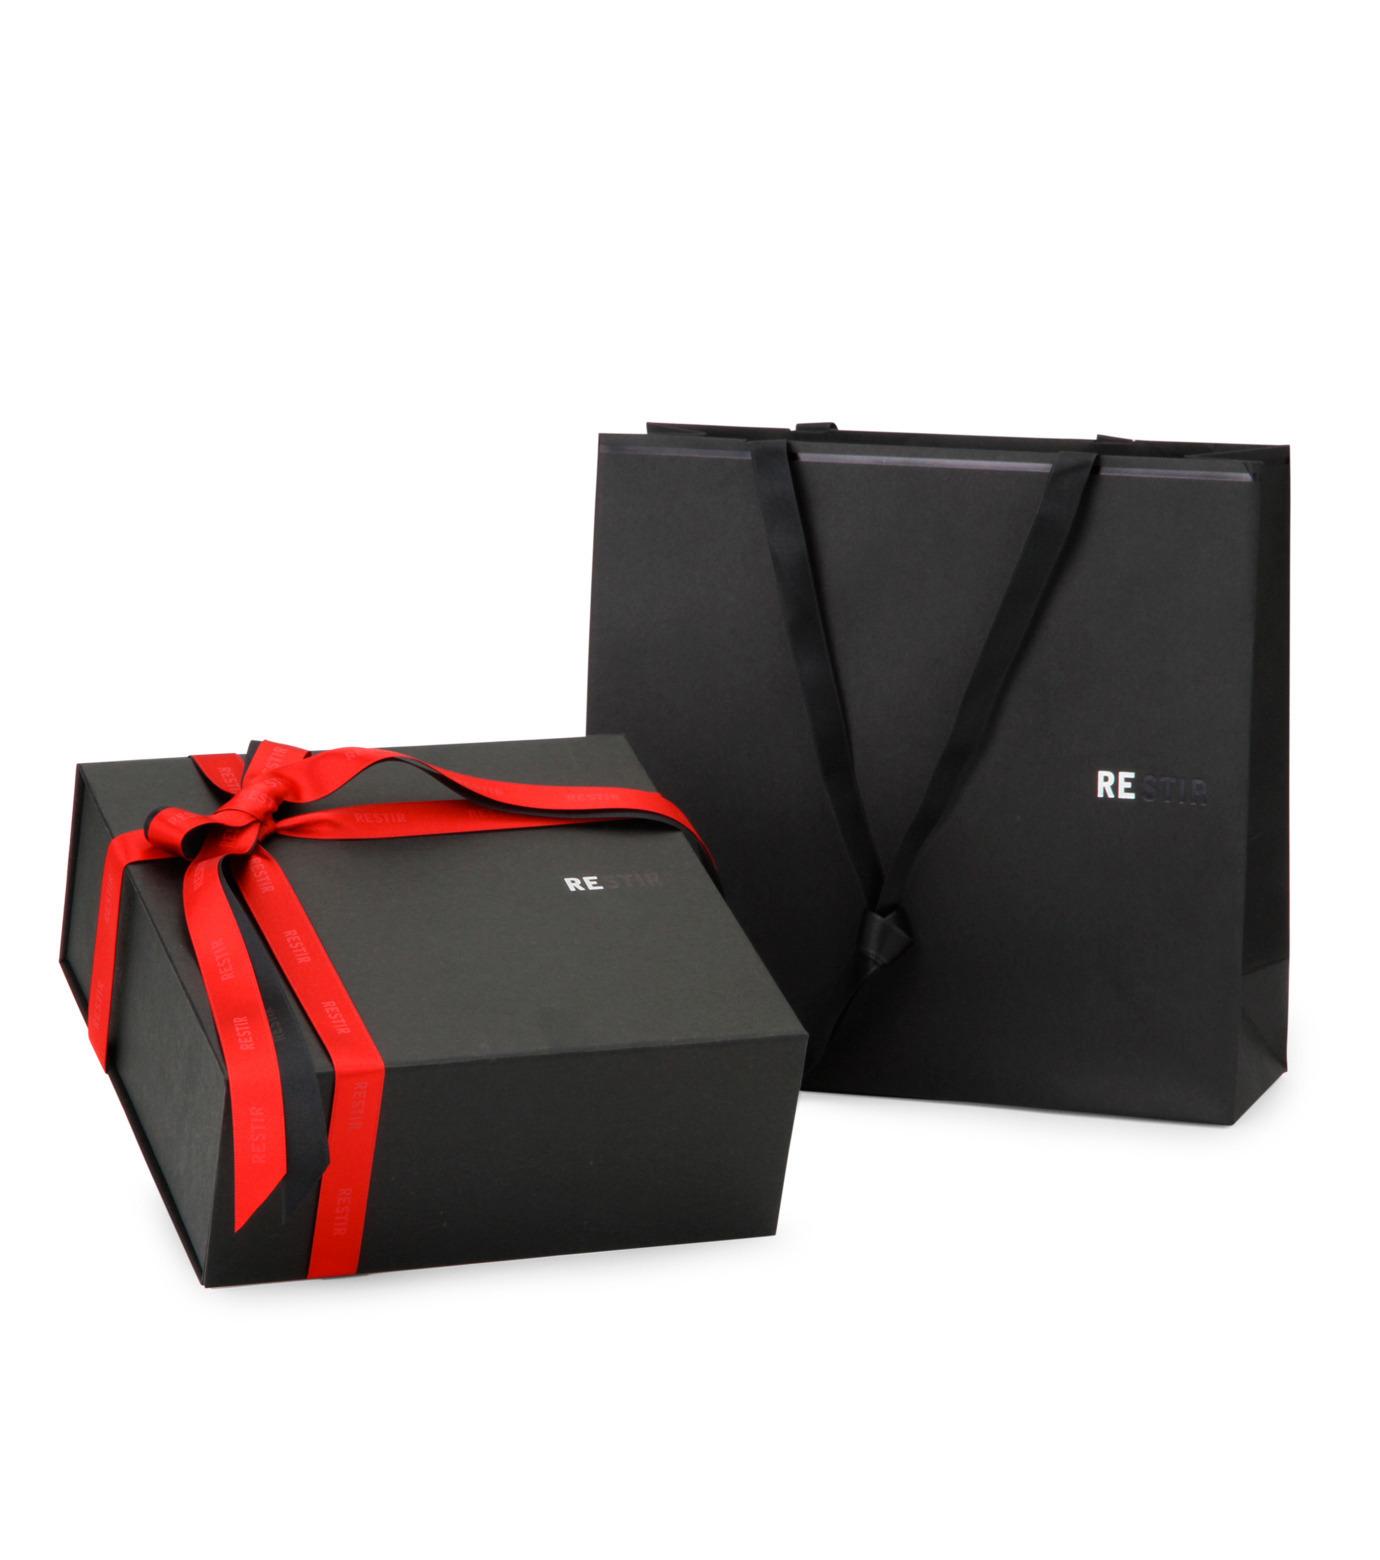 Gift Set(ギフトセット)のWorld Travel-NONE-Giftset-trav-0 拡大詳細画像5